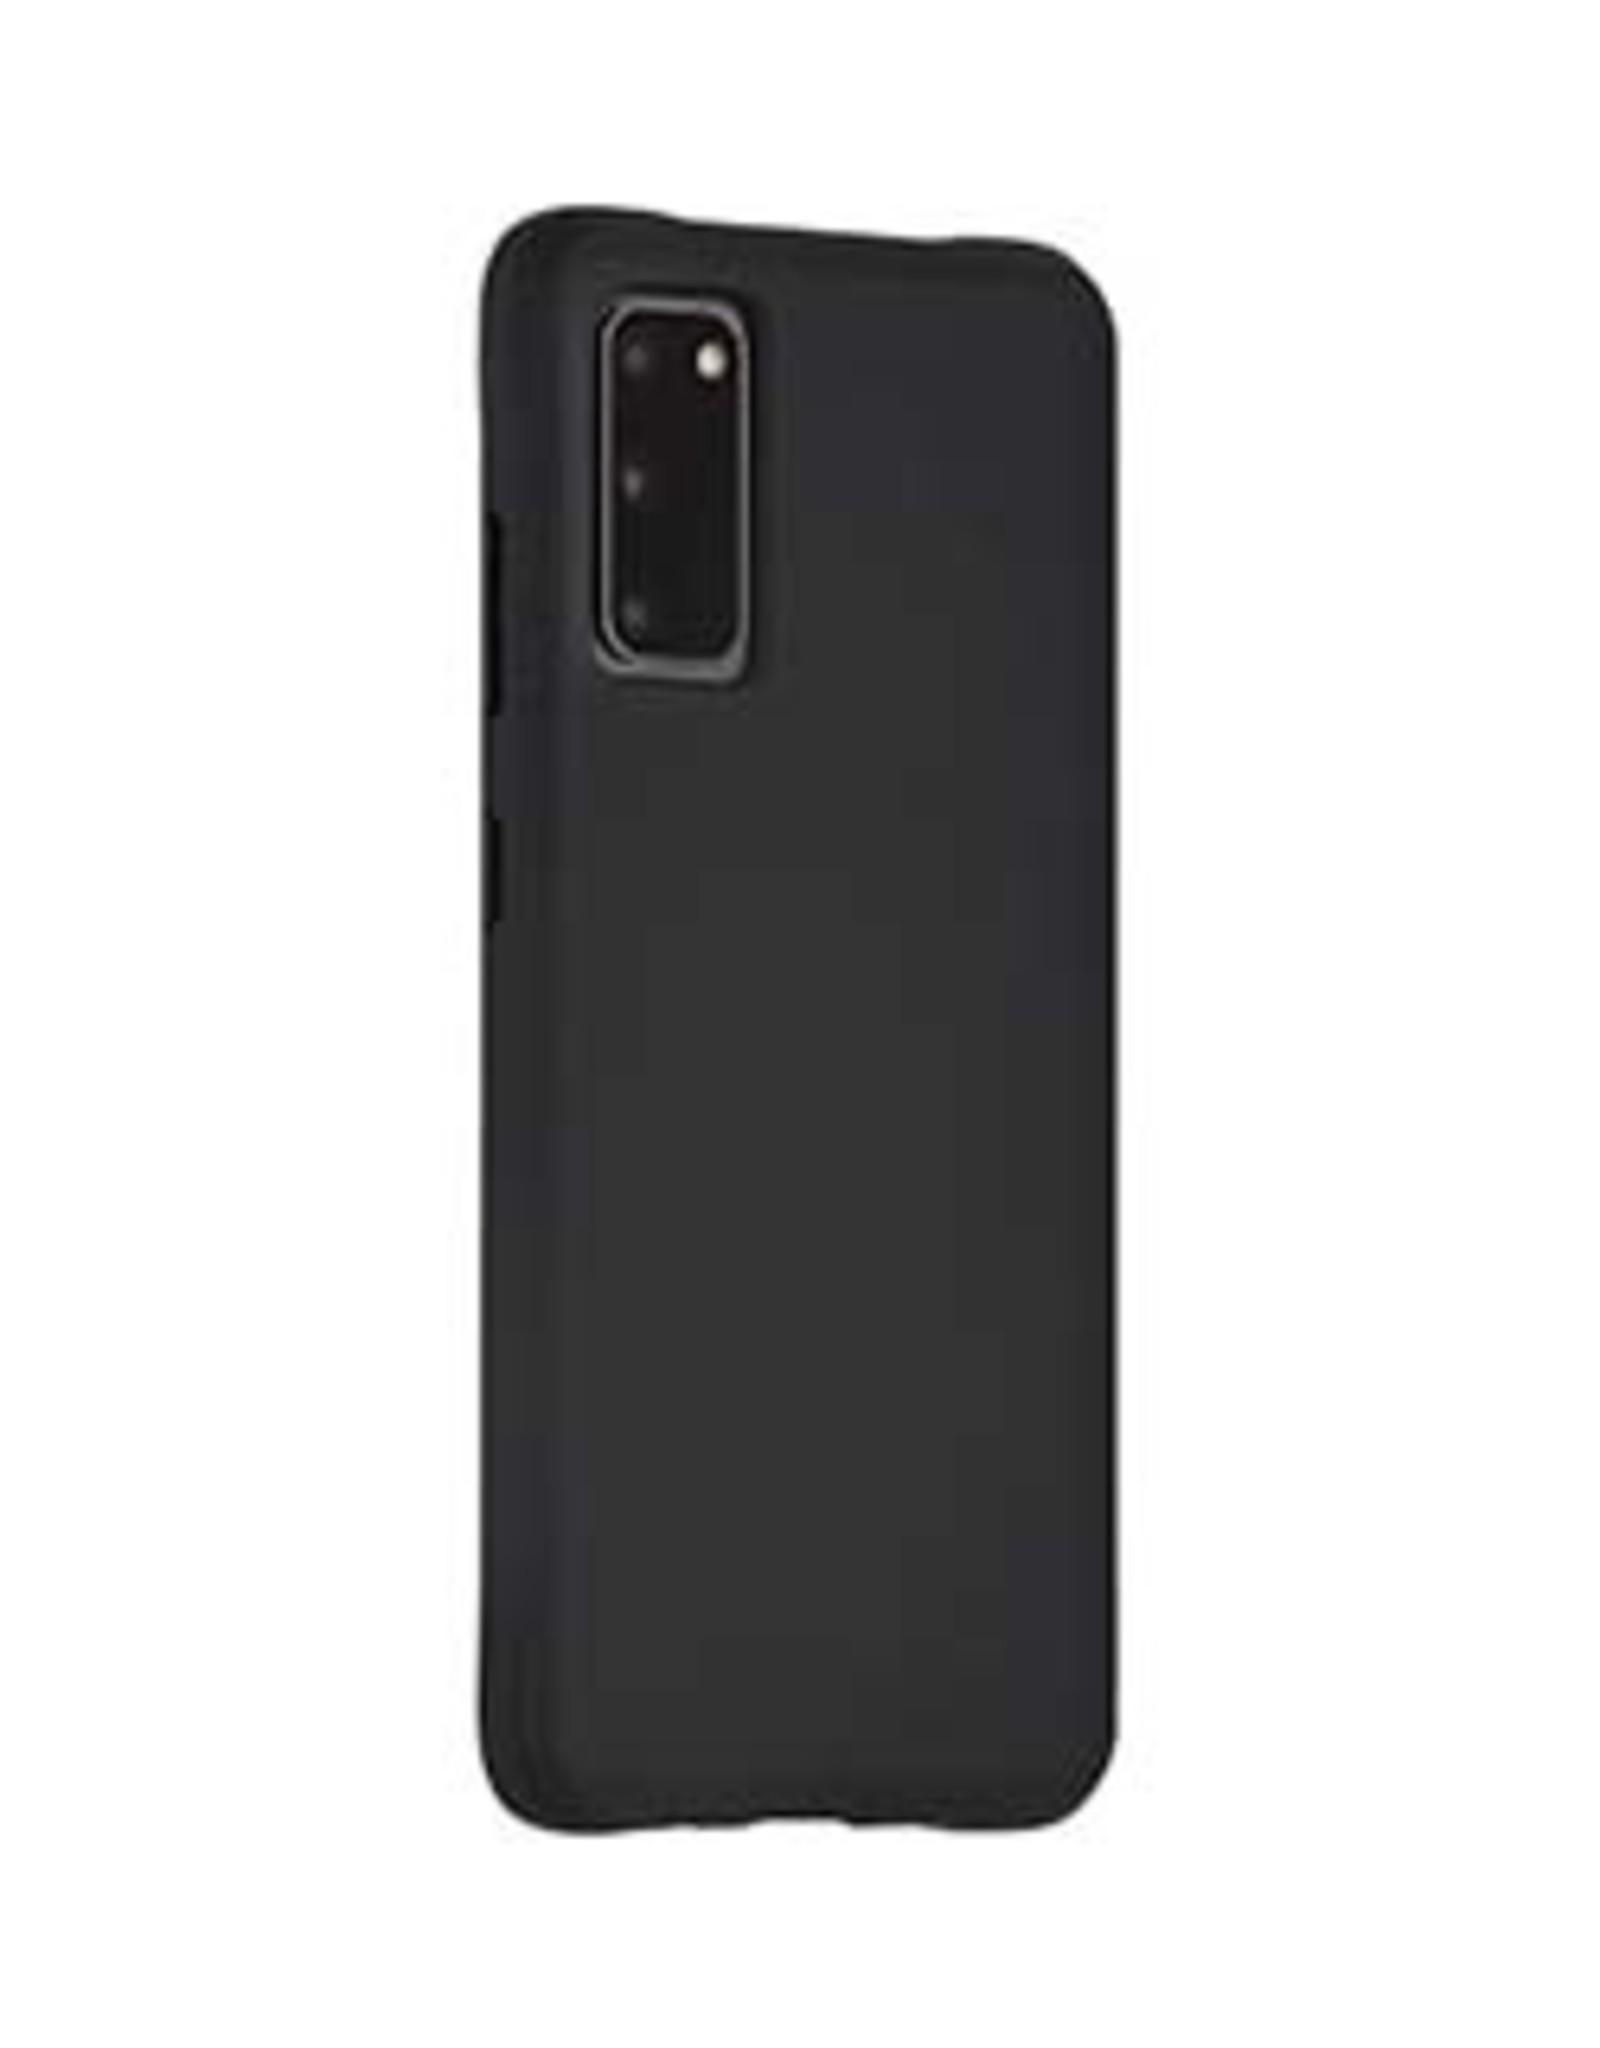 Case-Mate Case-Mate | Samsung Galaxy S20  Black (Smoke) Tough Case15-06659